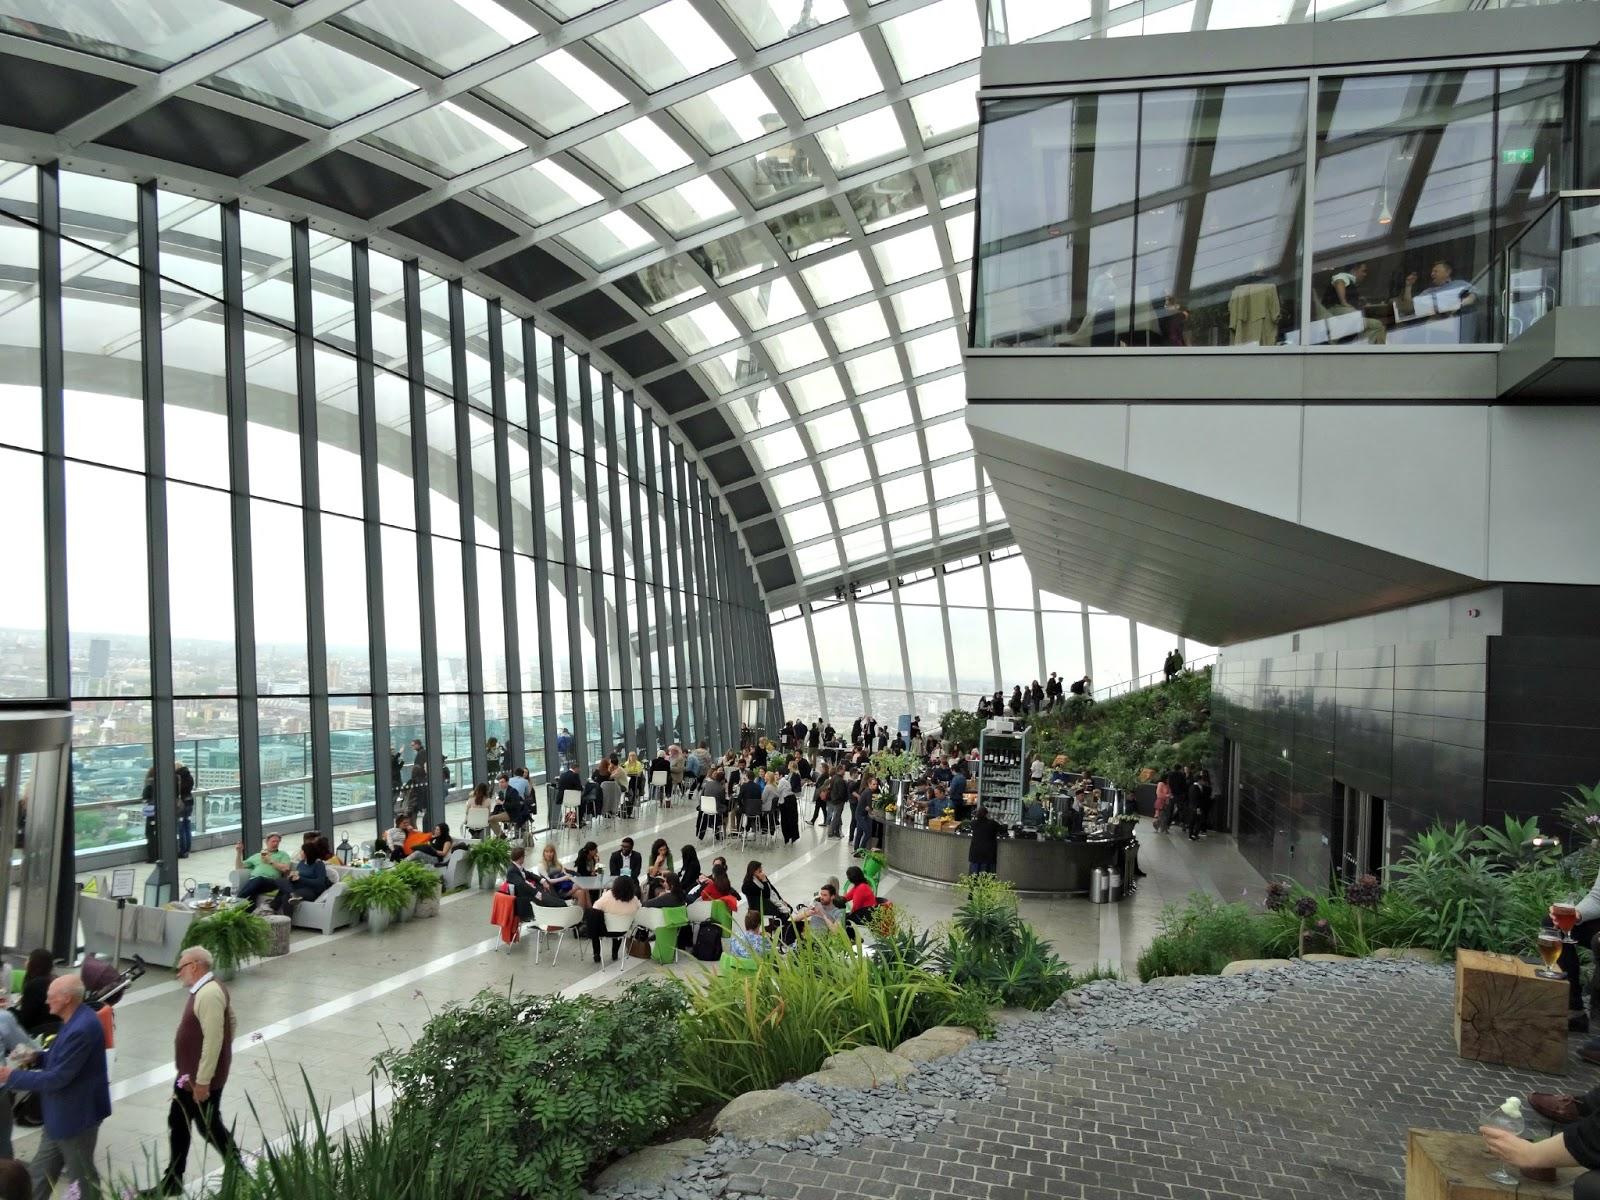 Sky Garden London review